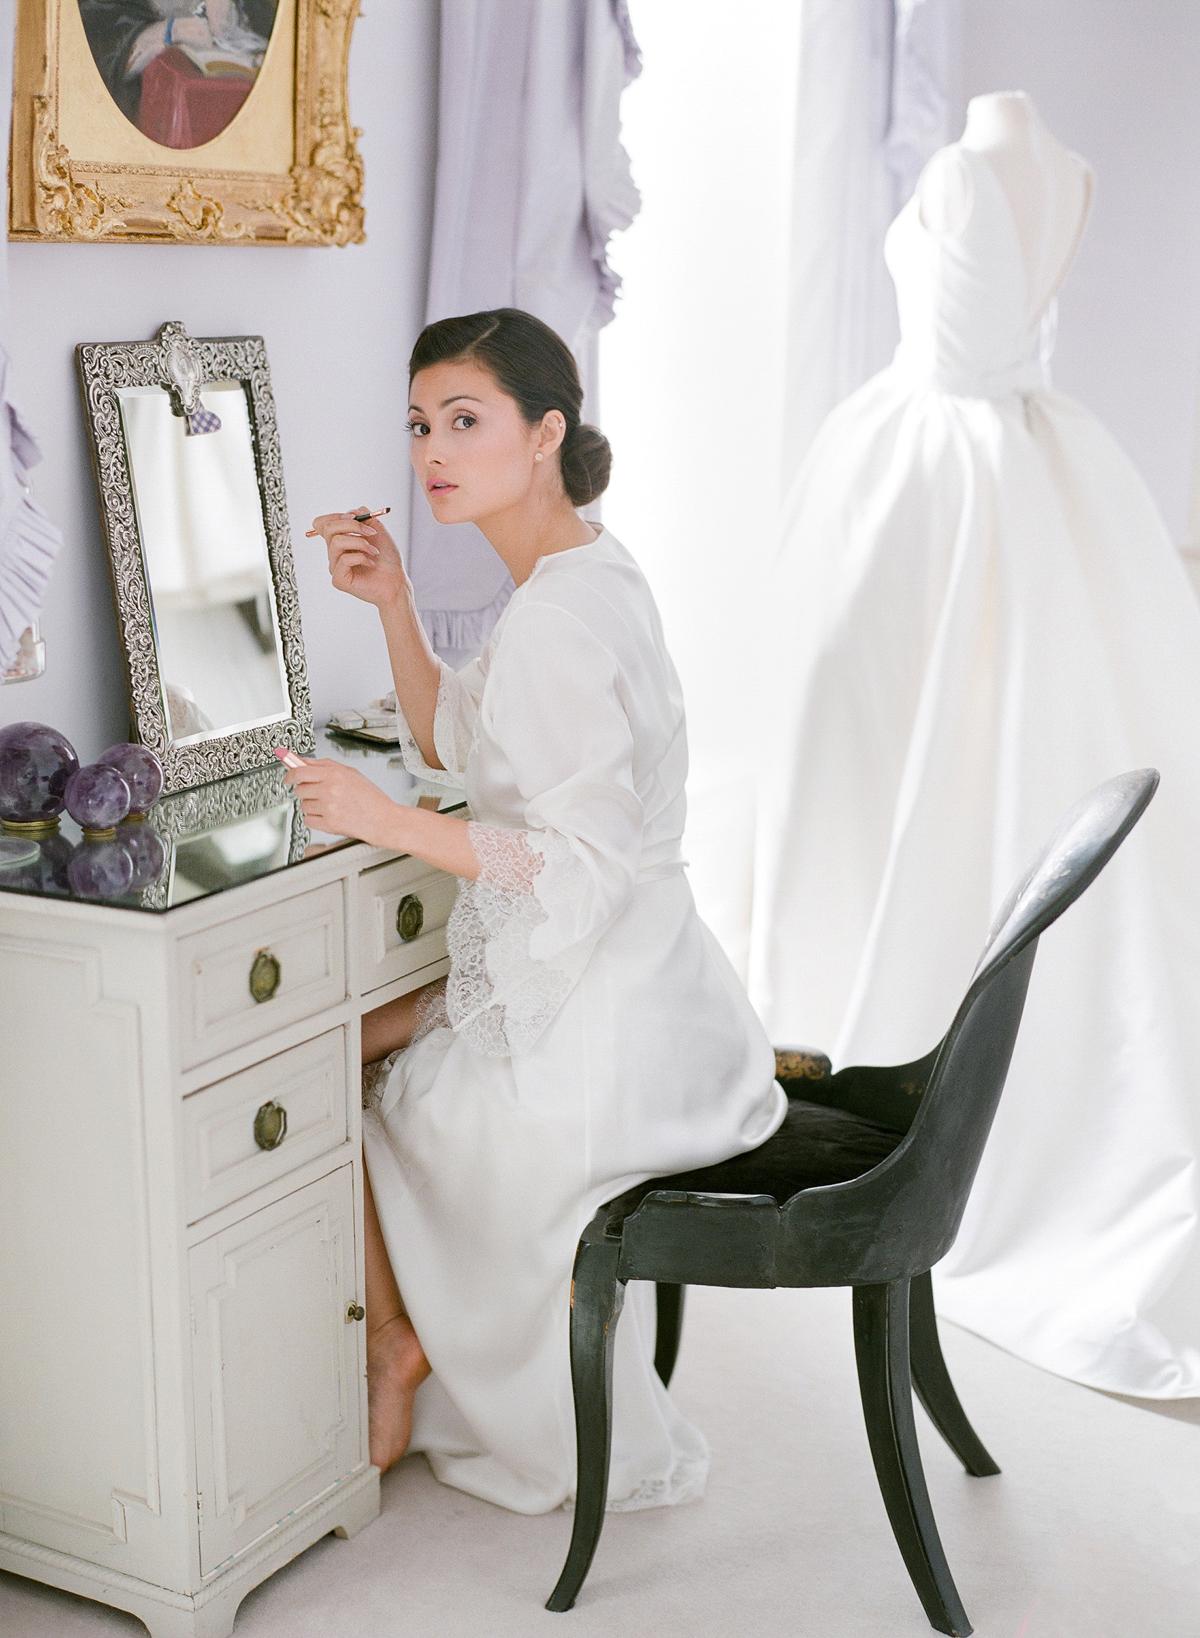 peony matthew england wedding bride getting ready